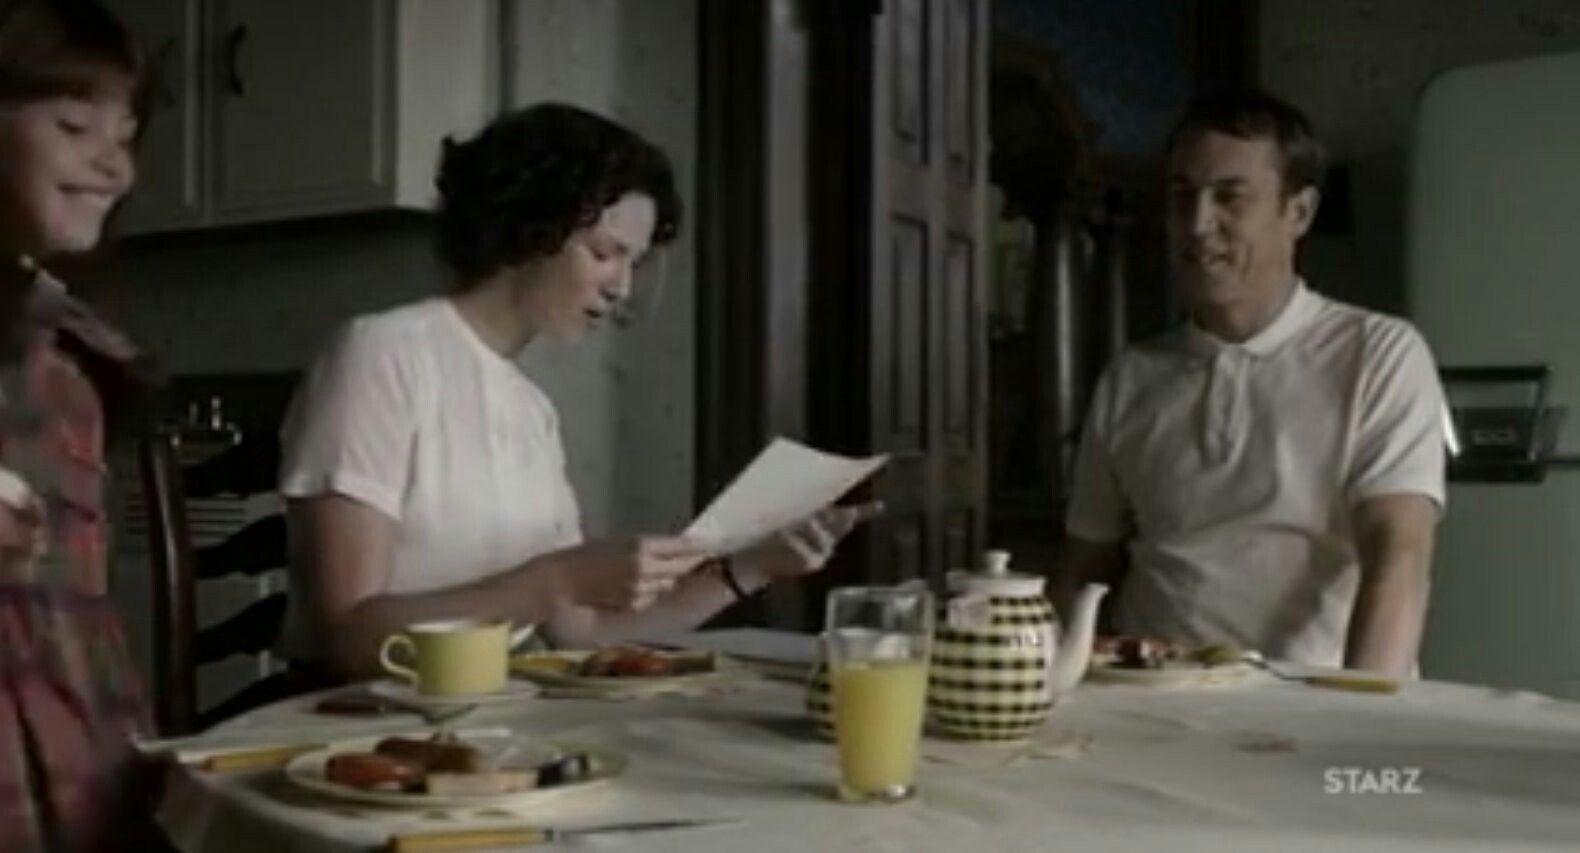 The Randall family at breakfast